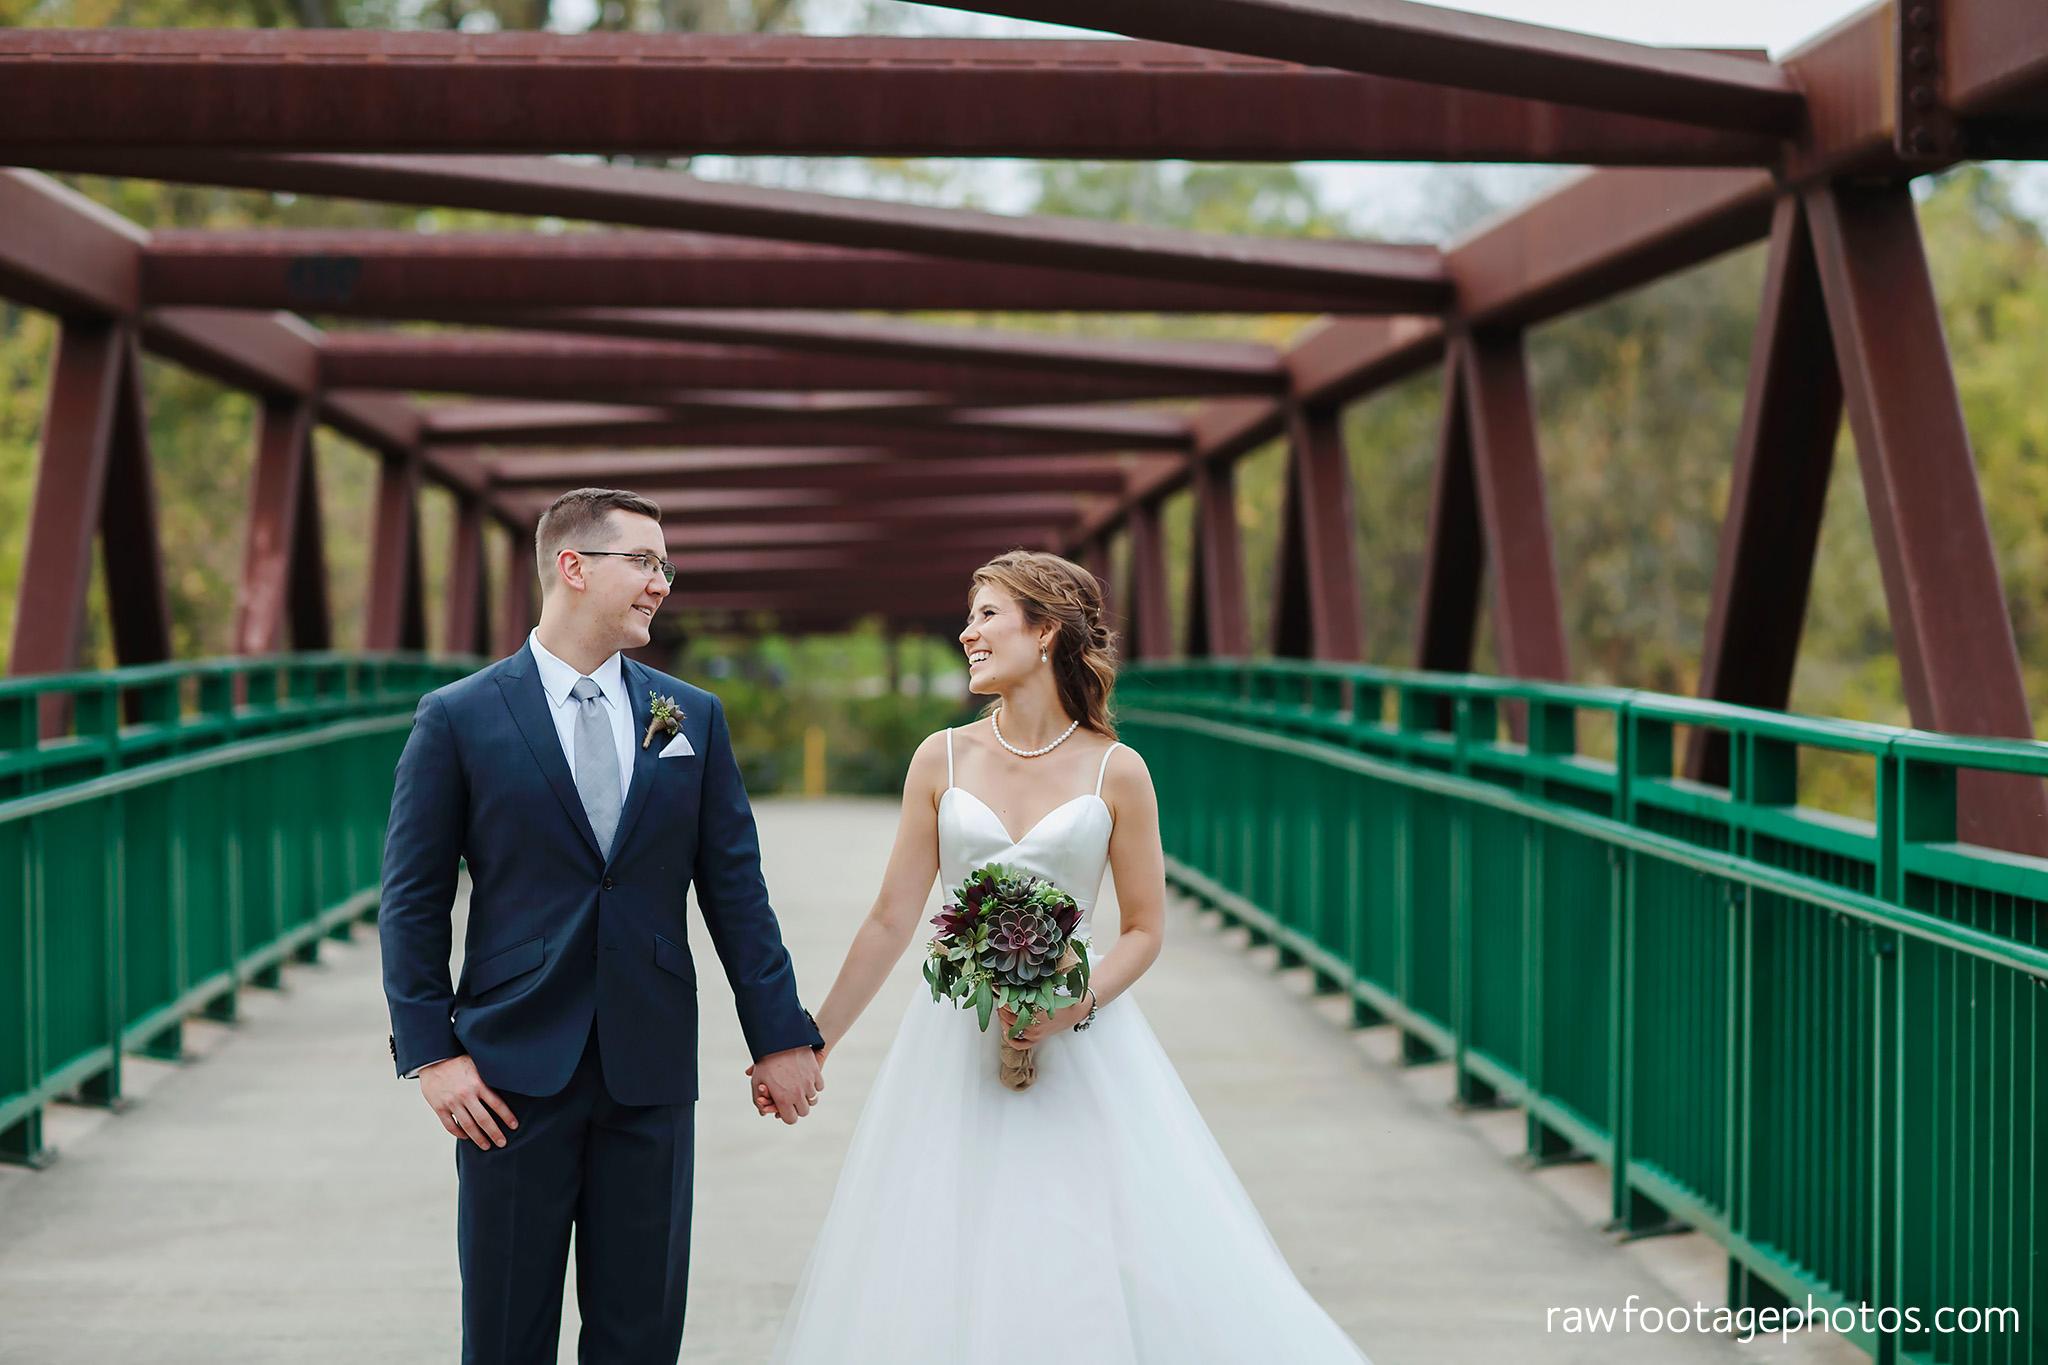 london_ontario_wedding_photographer-civic_gardens-springbank_park-succulent_bouquet-fall_wedding-bridge-raw_footage_photography067.jpg